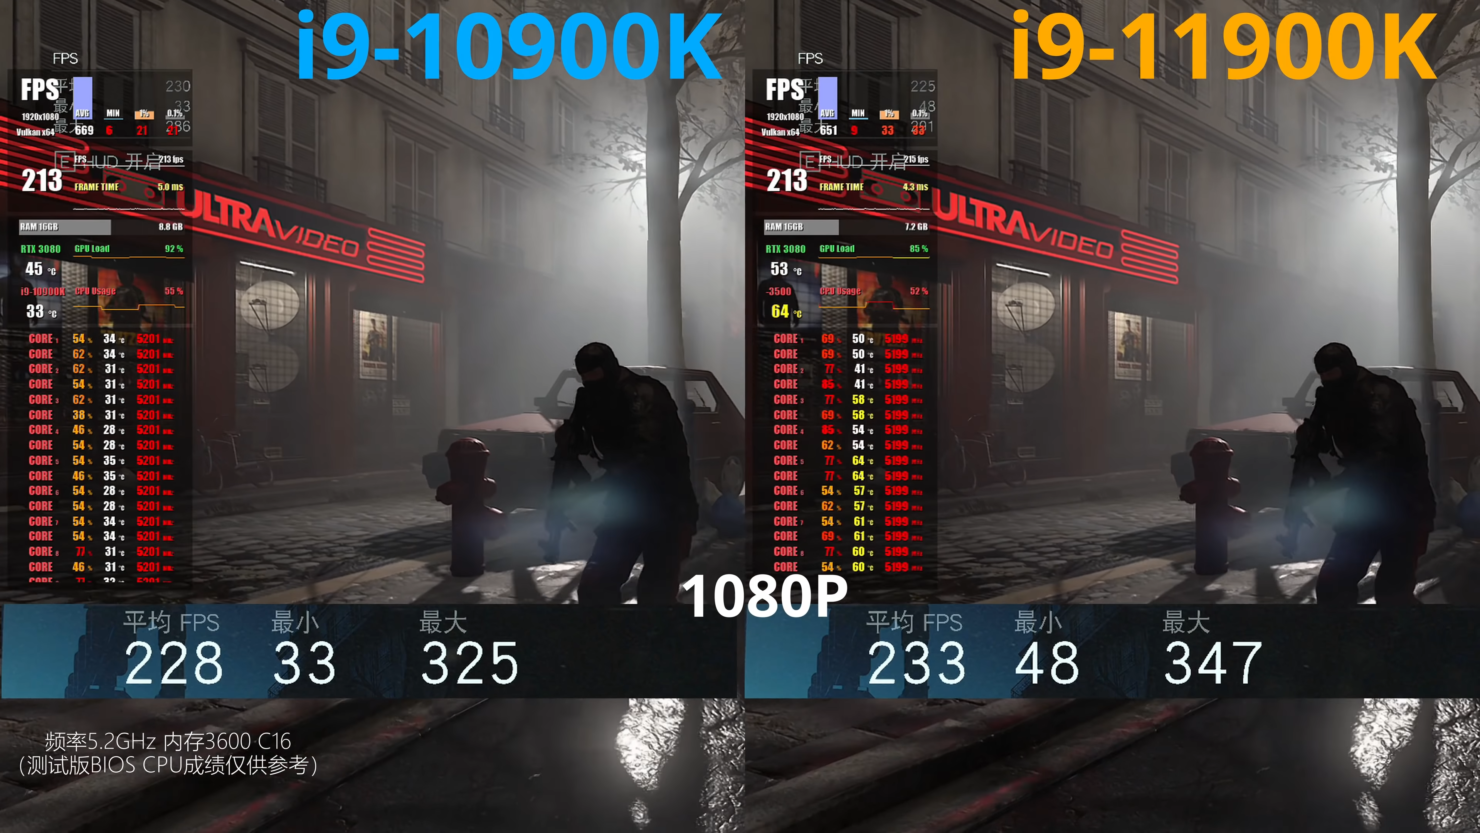 intel-core-i9-11900k-8-core-rocket-lake-vs-core-i9-10900k-10-core-comet-lake-cpu-_-5-2-ghz-overclock-_-watch-dogs